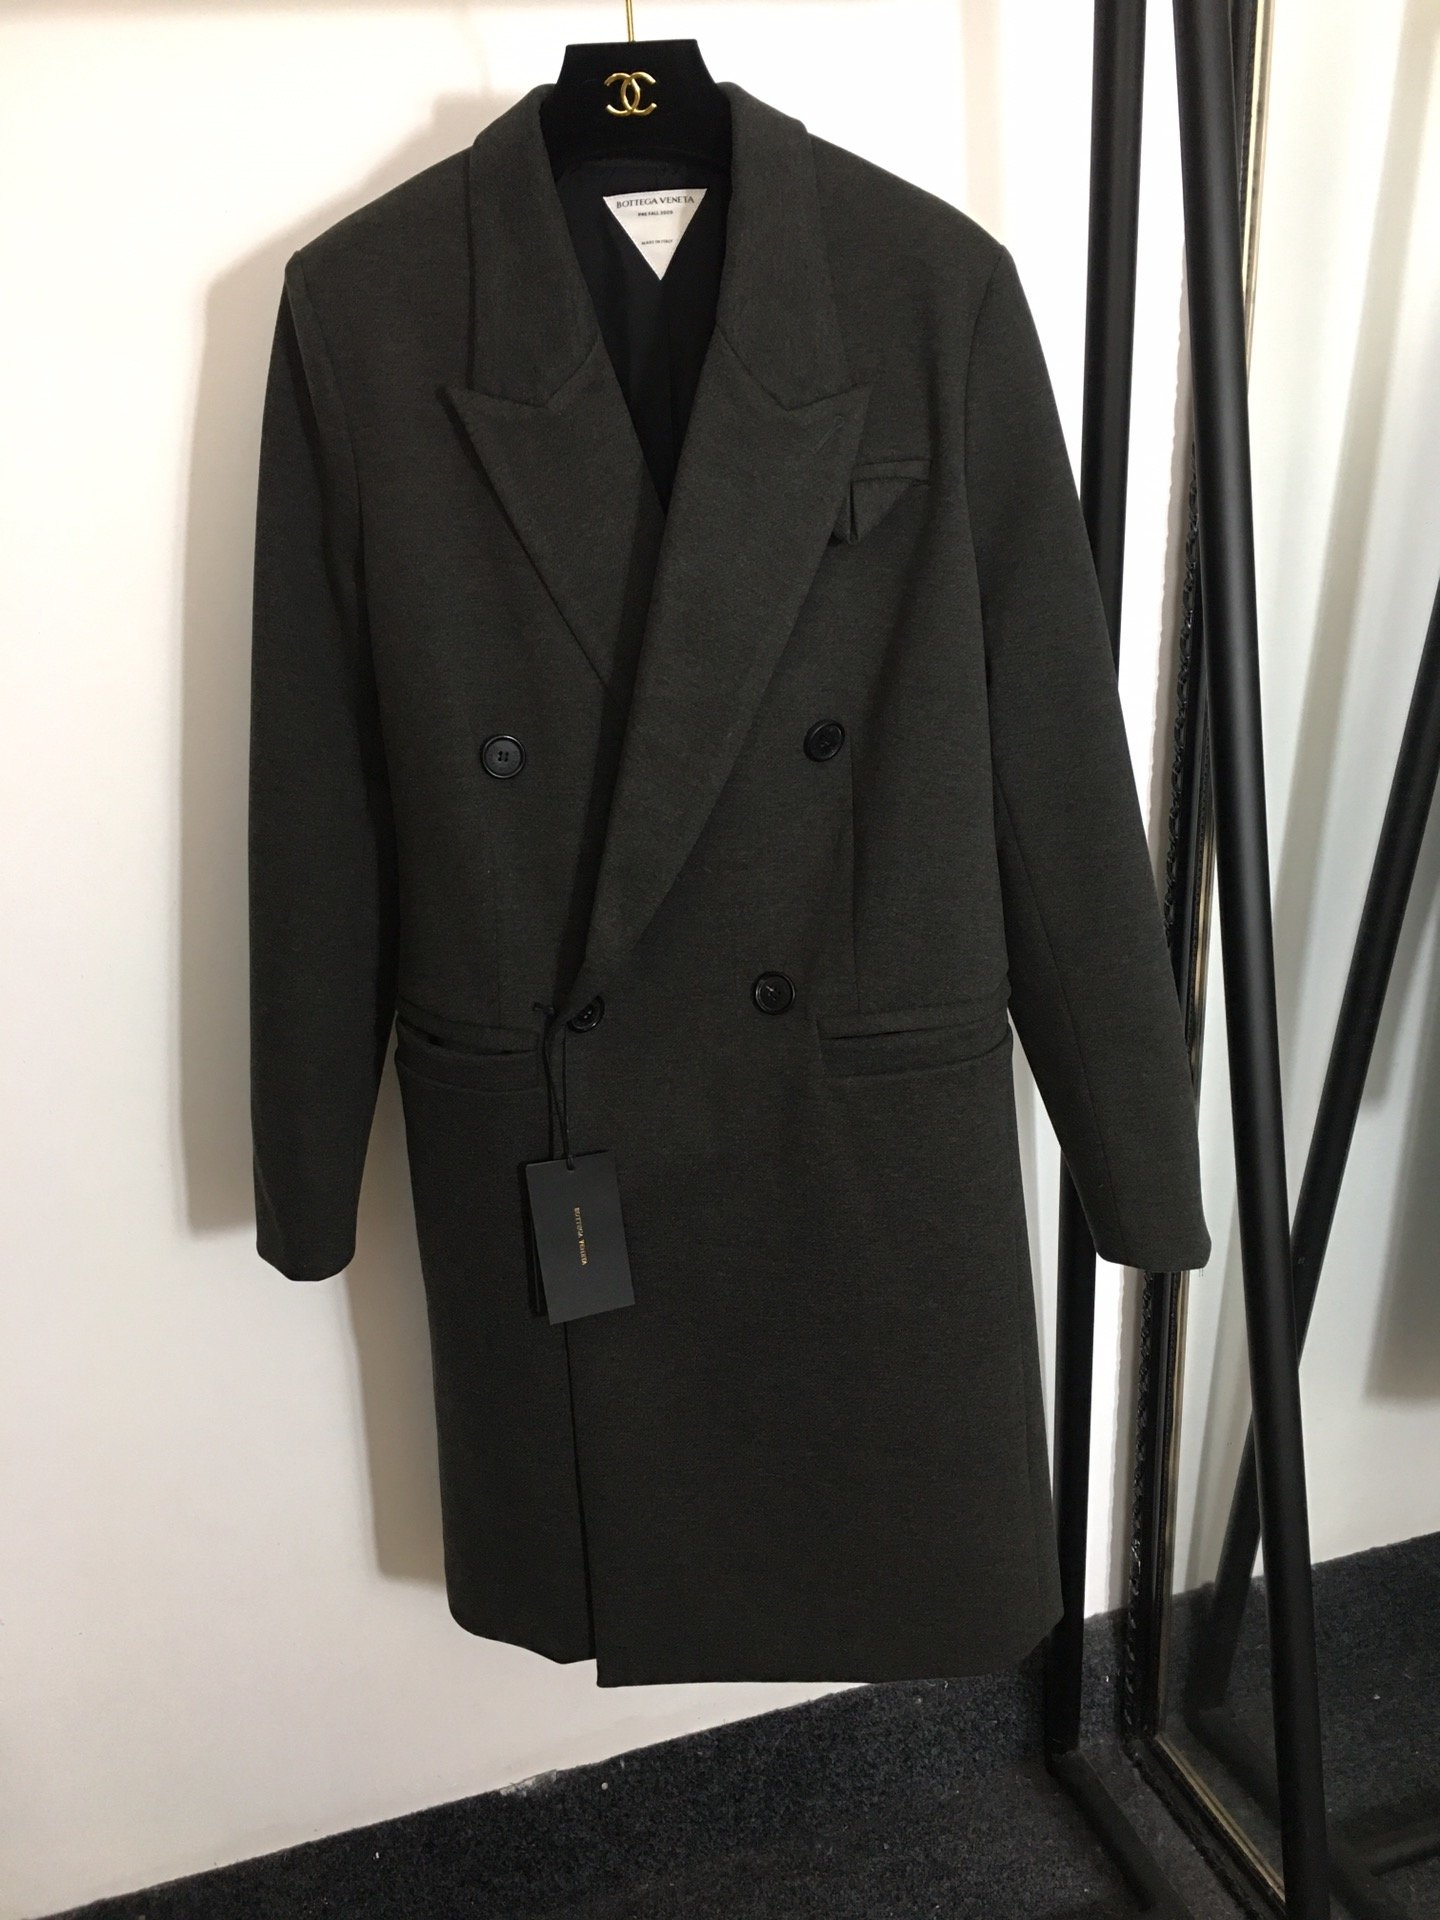 BV新款时尚双排扣毛呢大衣中长款西装